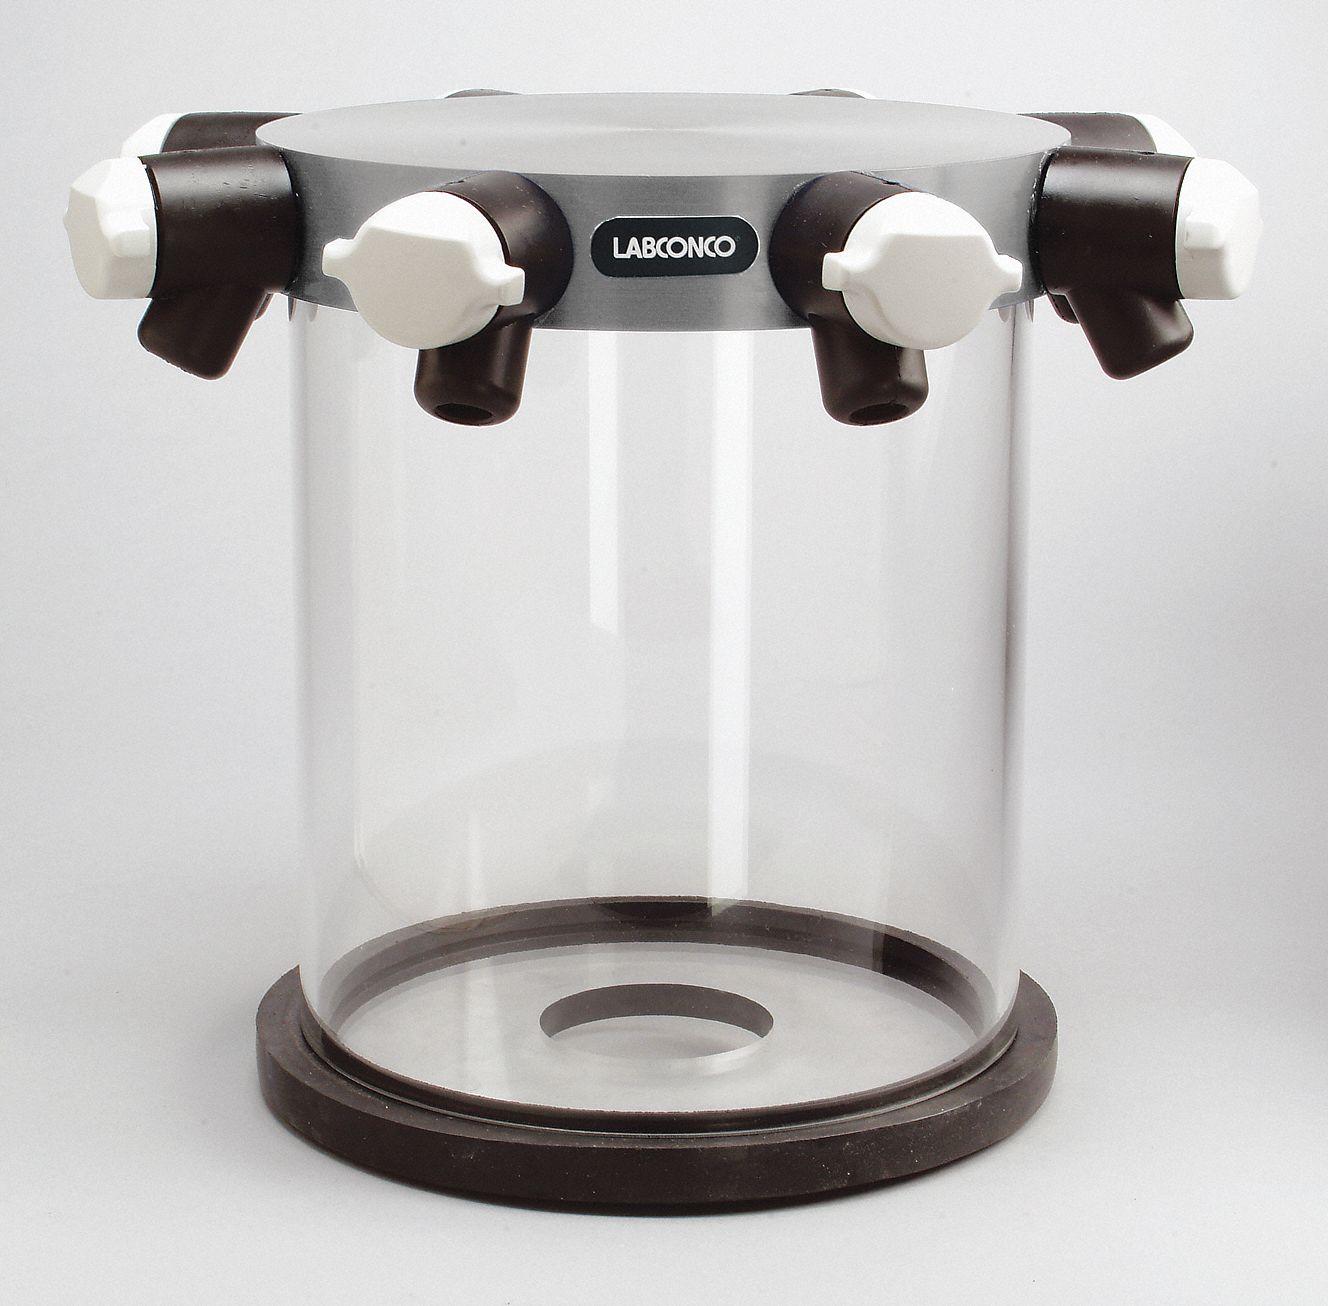 Laboratory Freeze Dryer Accessories